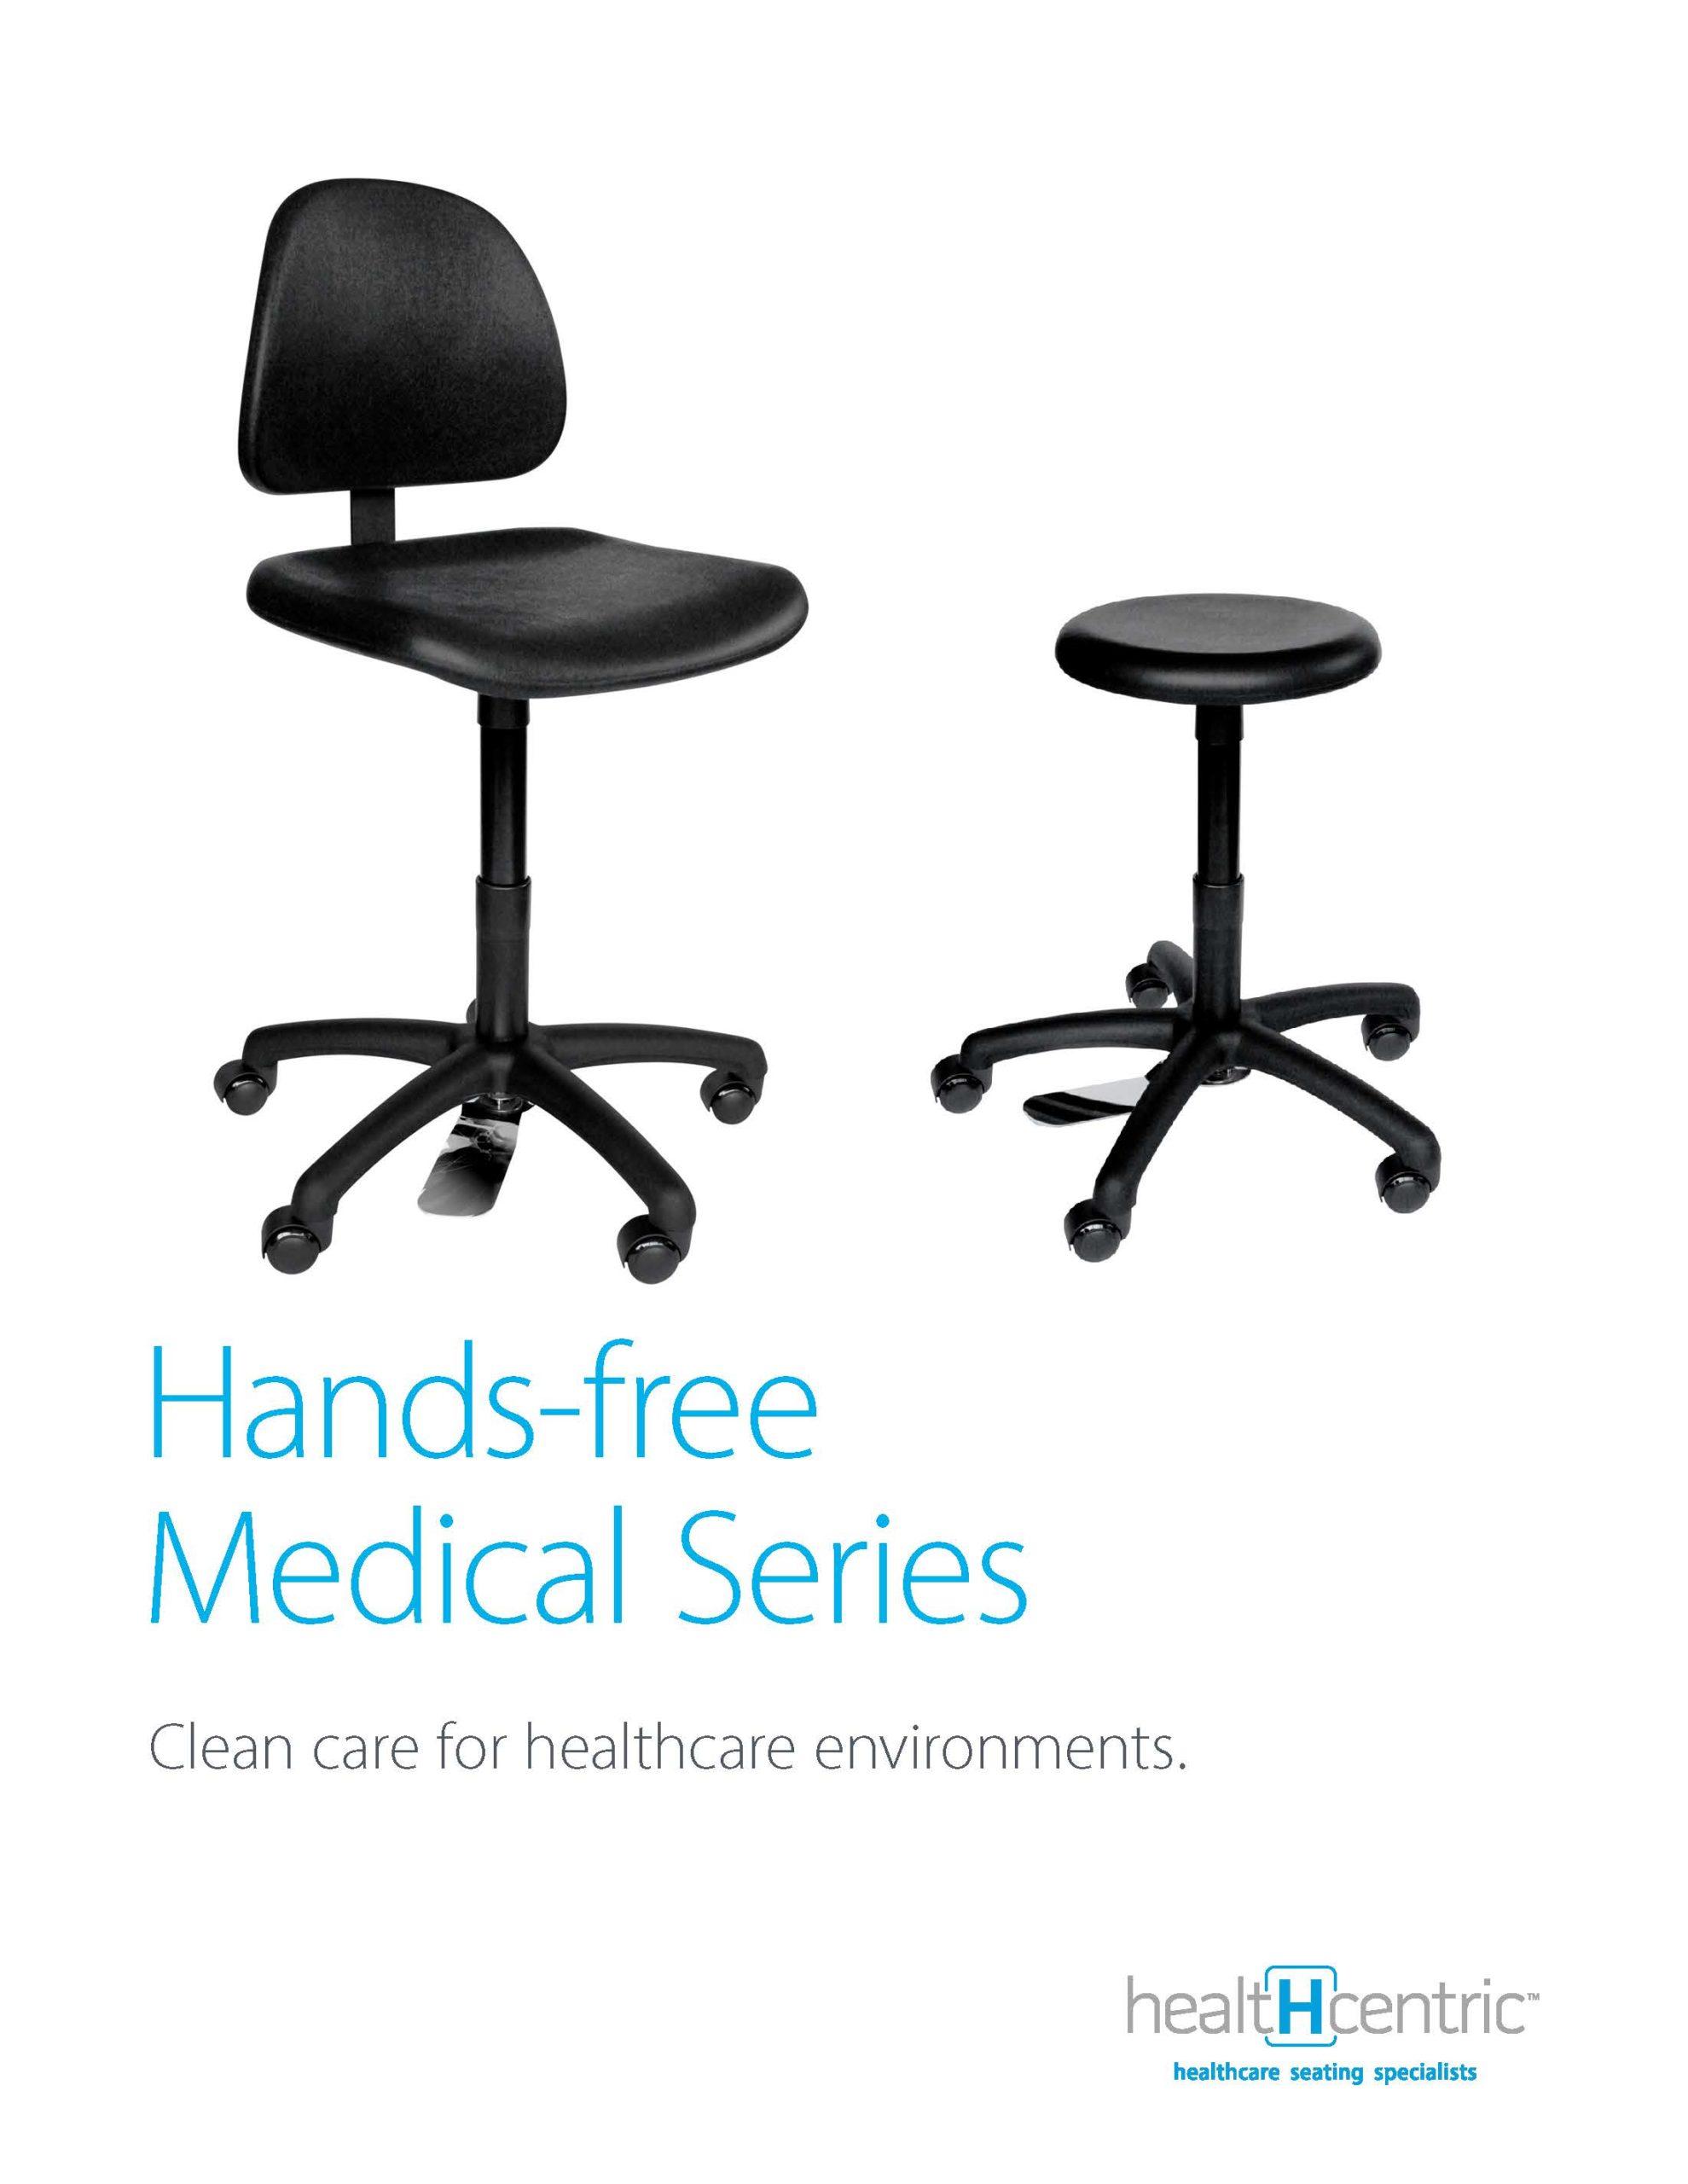 Hands Free Medical Series